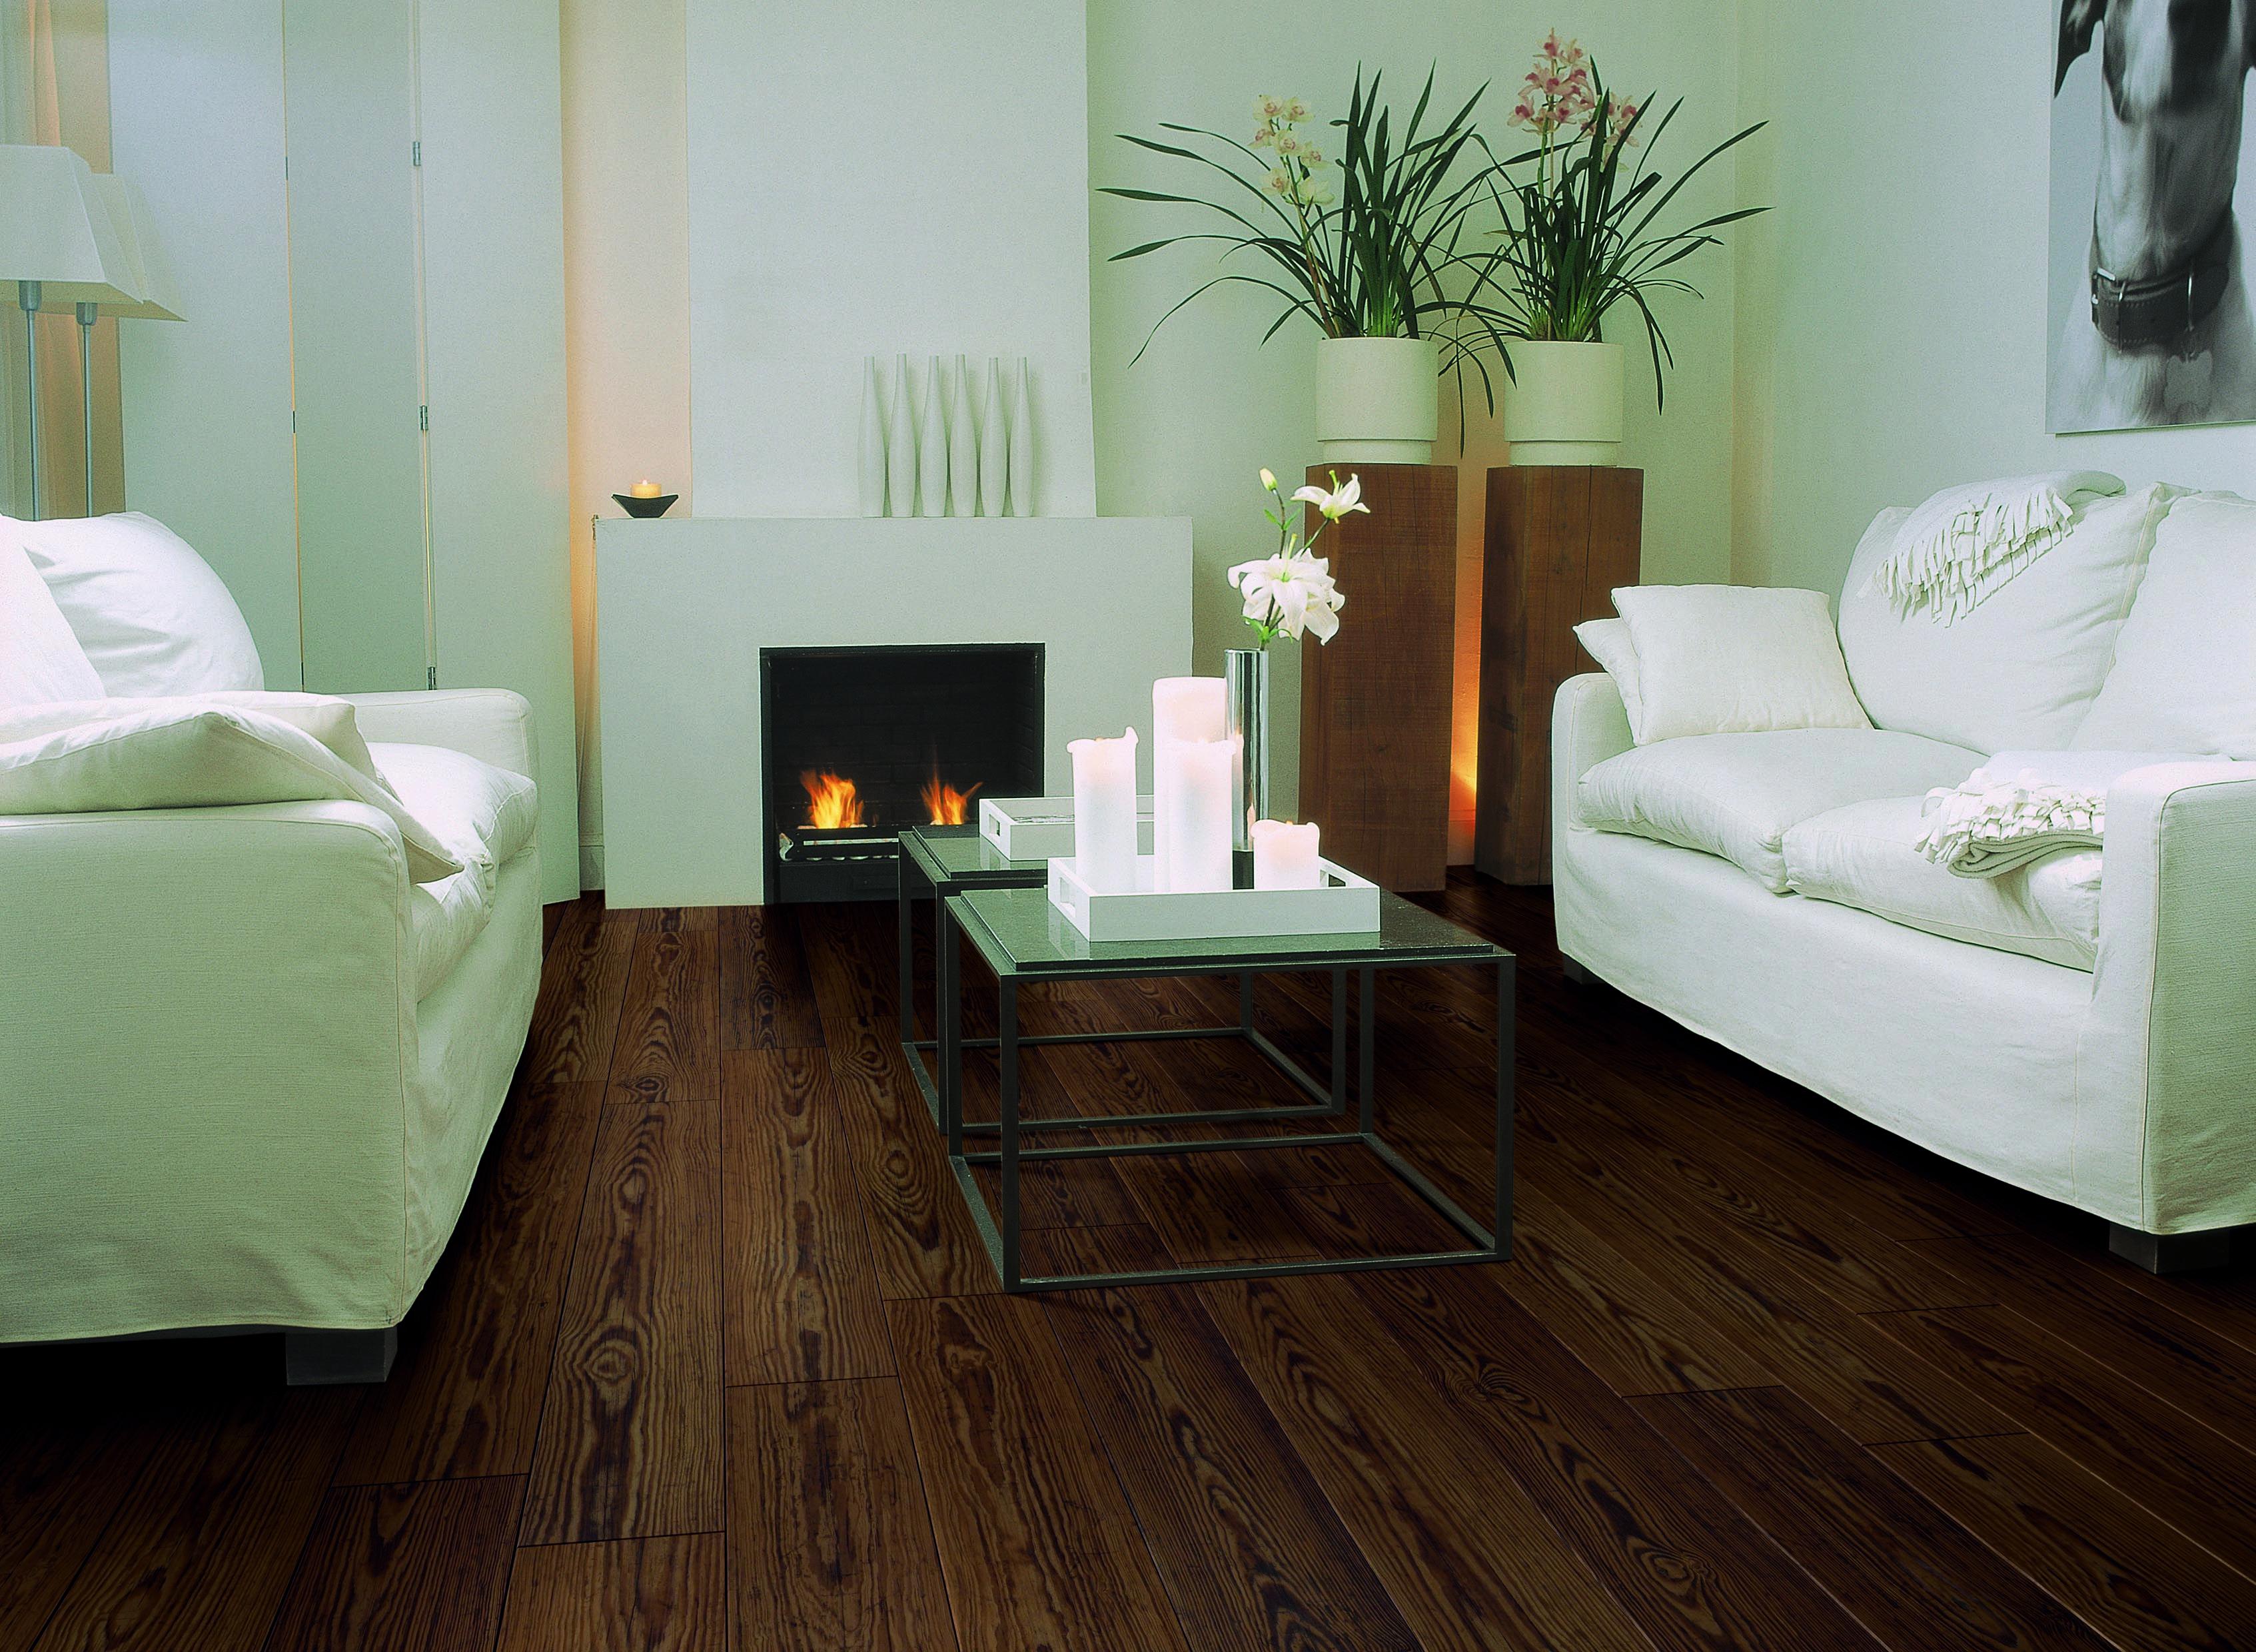 Eiken Vloeren Limburg : Houten vloeren limburg u a nieuwe houten vloer van fabritius home